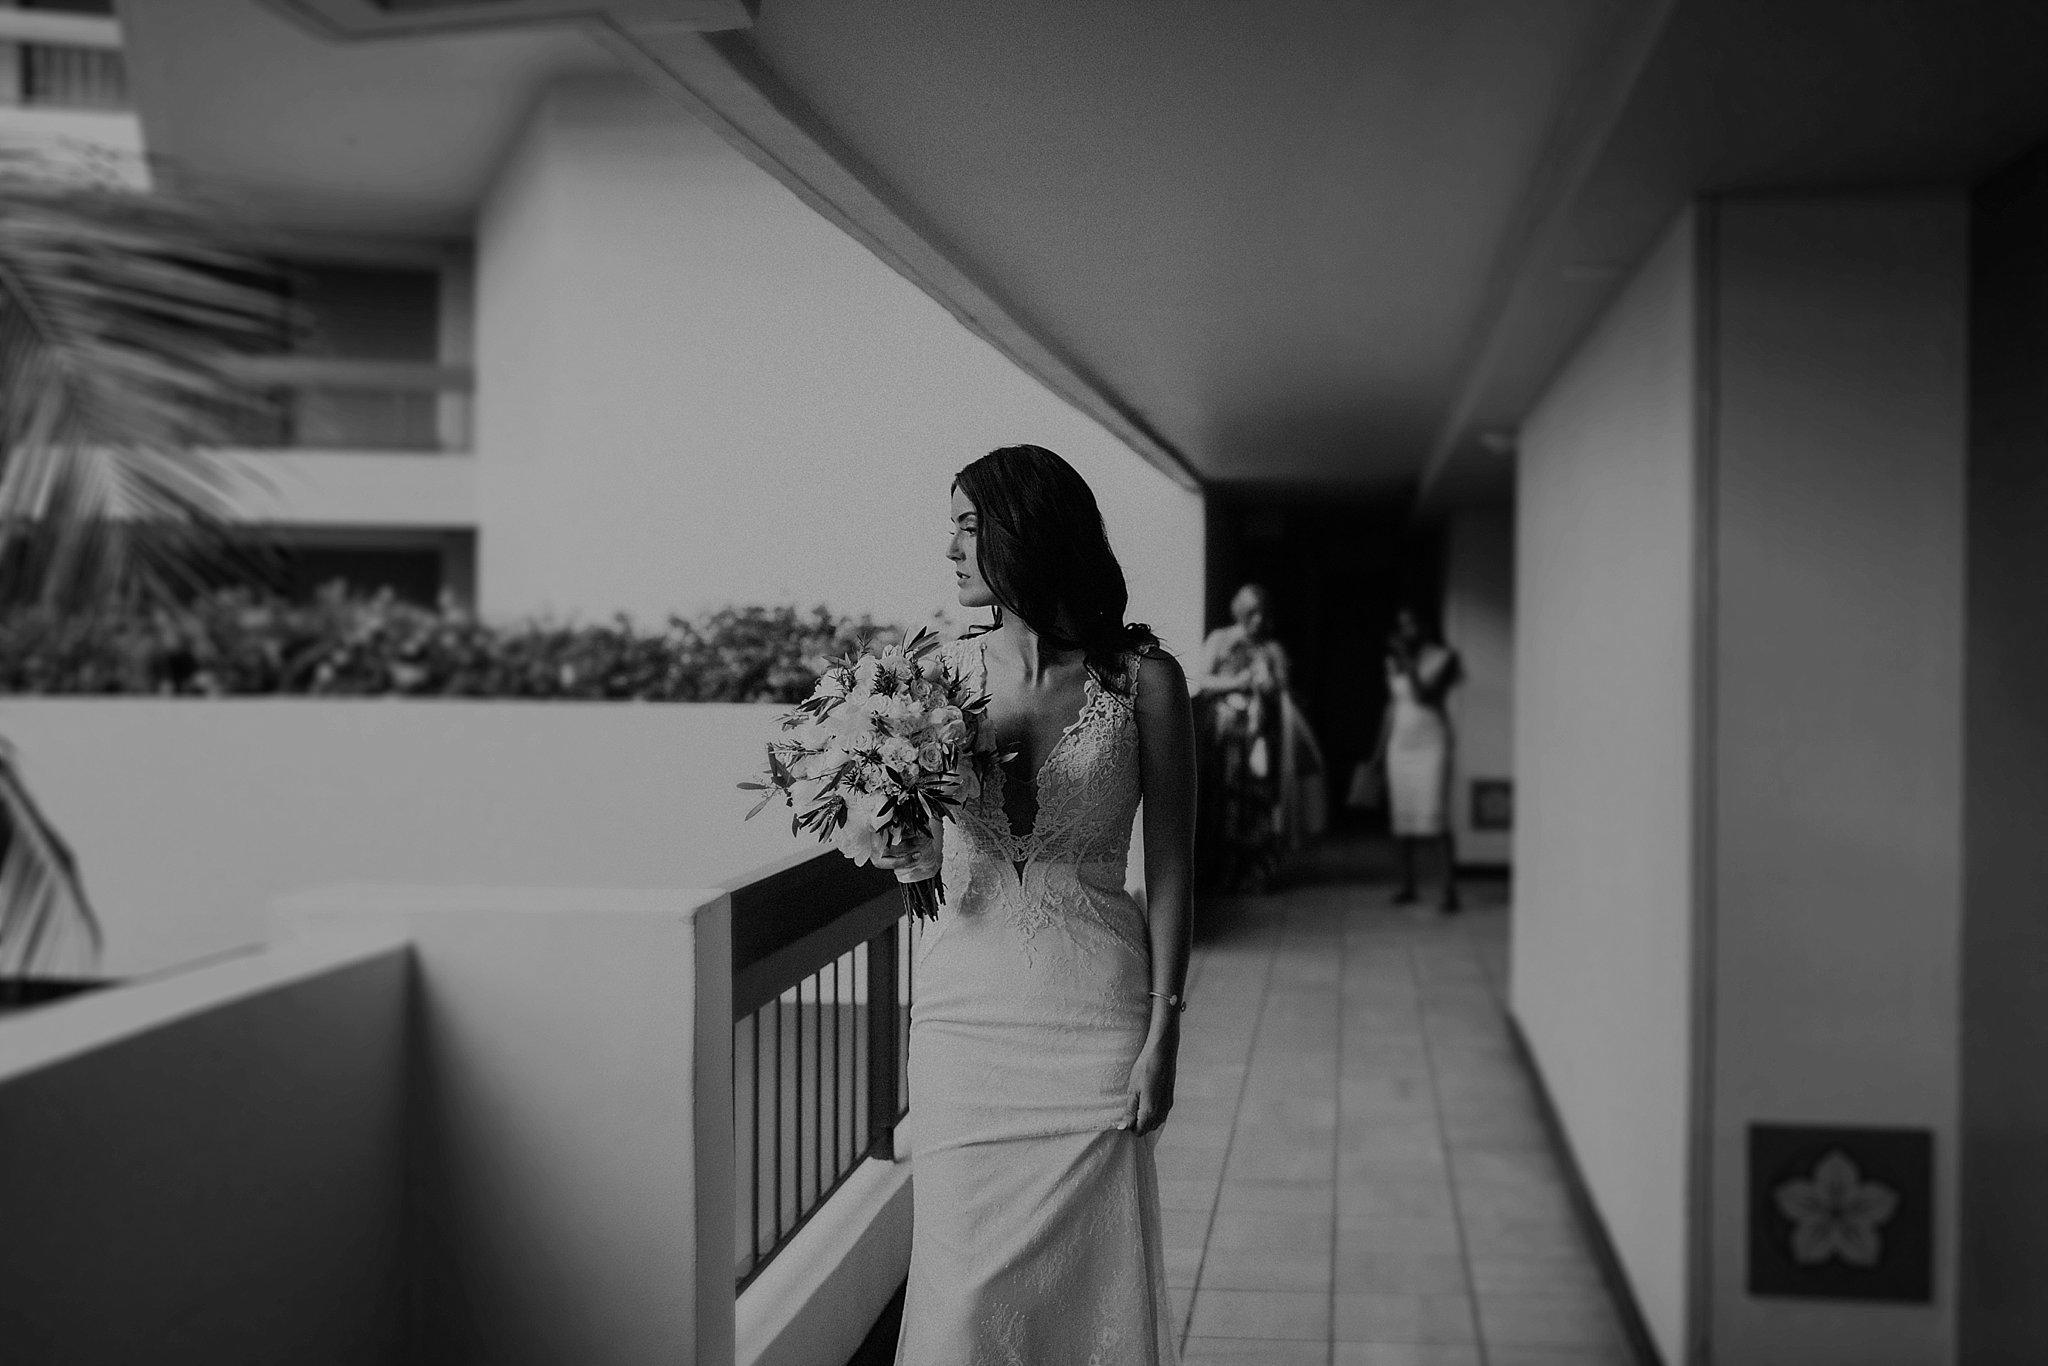 samantha_mcfarlen_bellingham_washington_engagement_photography_seattle_wedding_photographer_0188.jpg